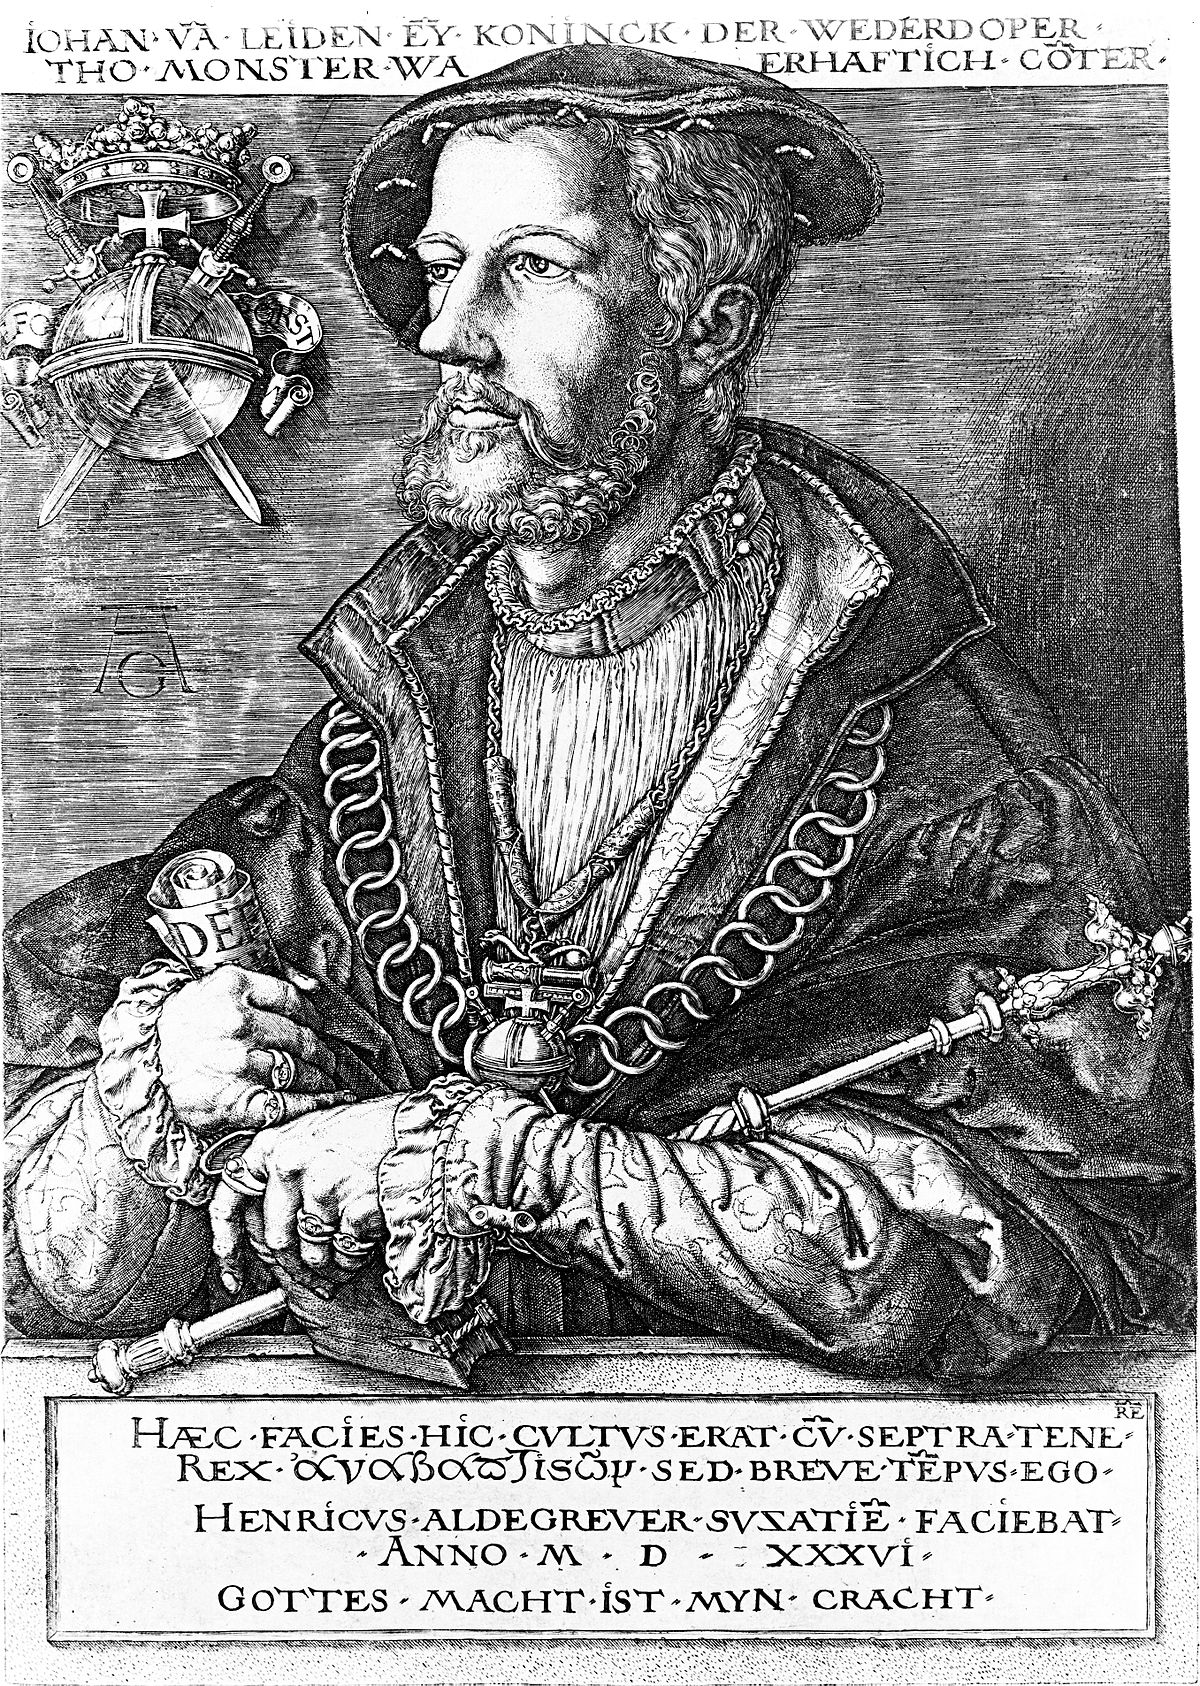 Le Prophete Jan_van_Leiden_by_Aldegrever